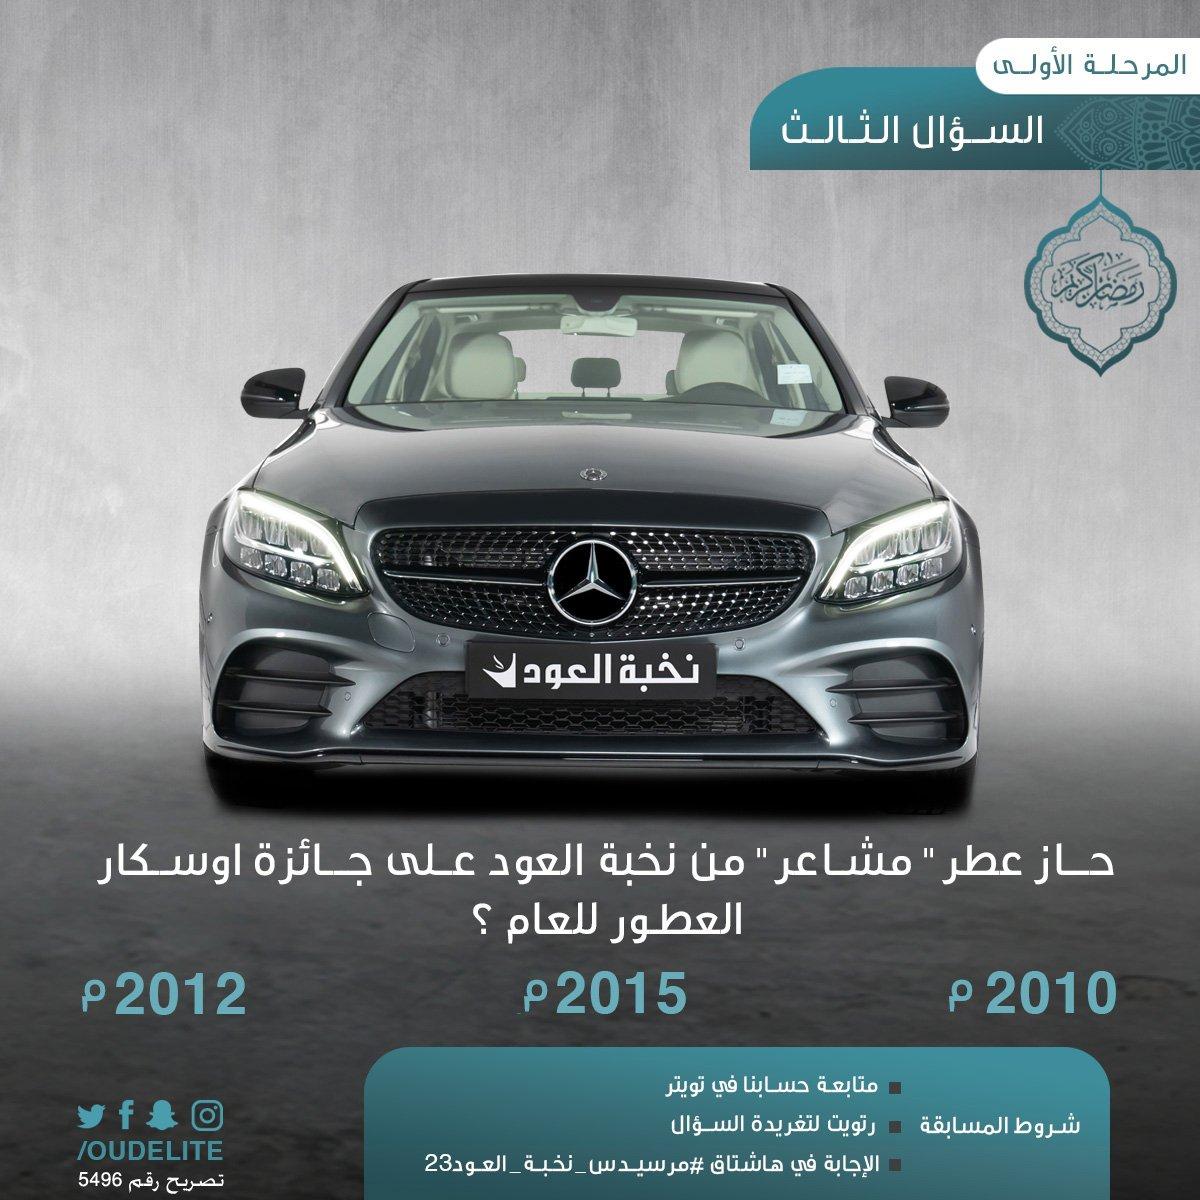 b8c355360098b Twitter Trends in Mecca